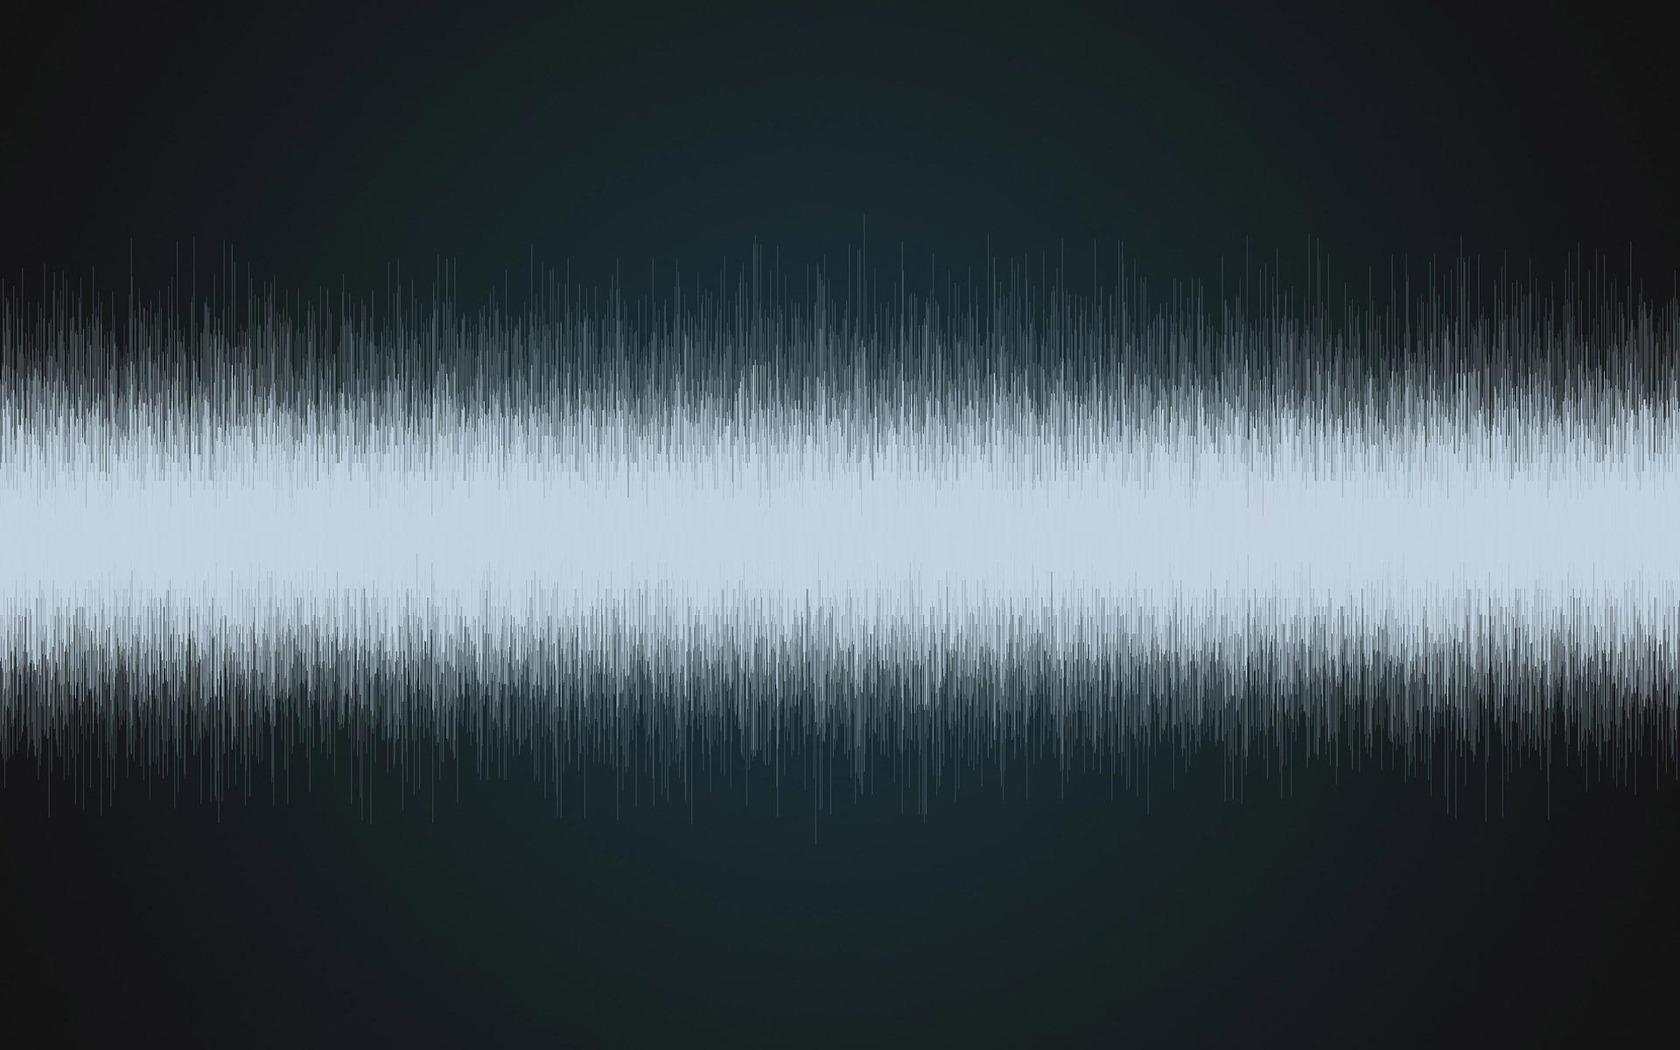 Sound waves wallpaper 194 1680x1050